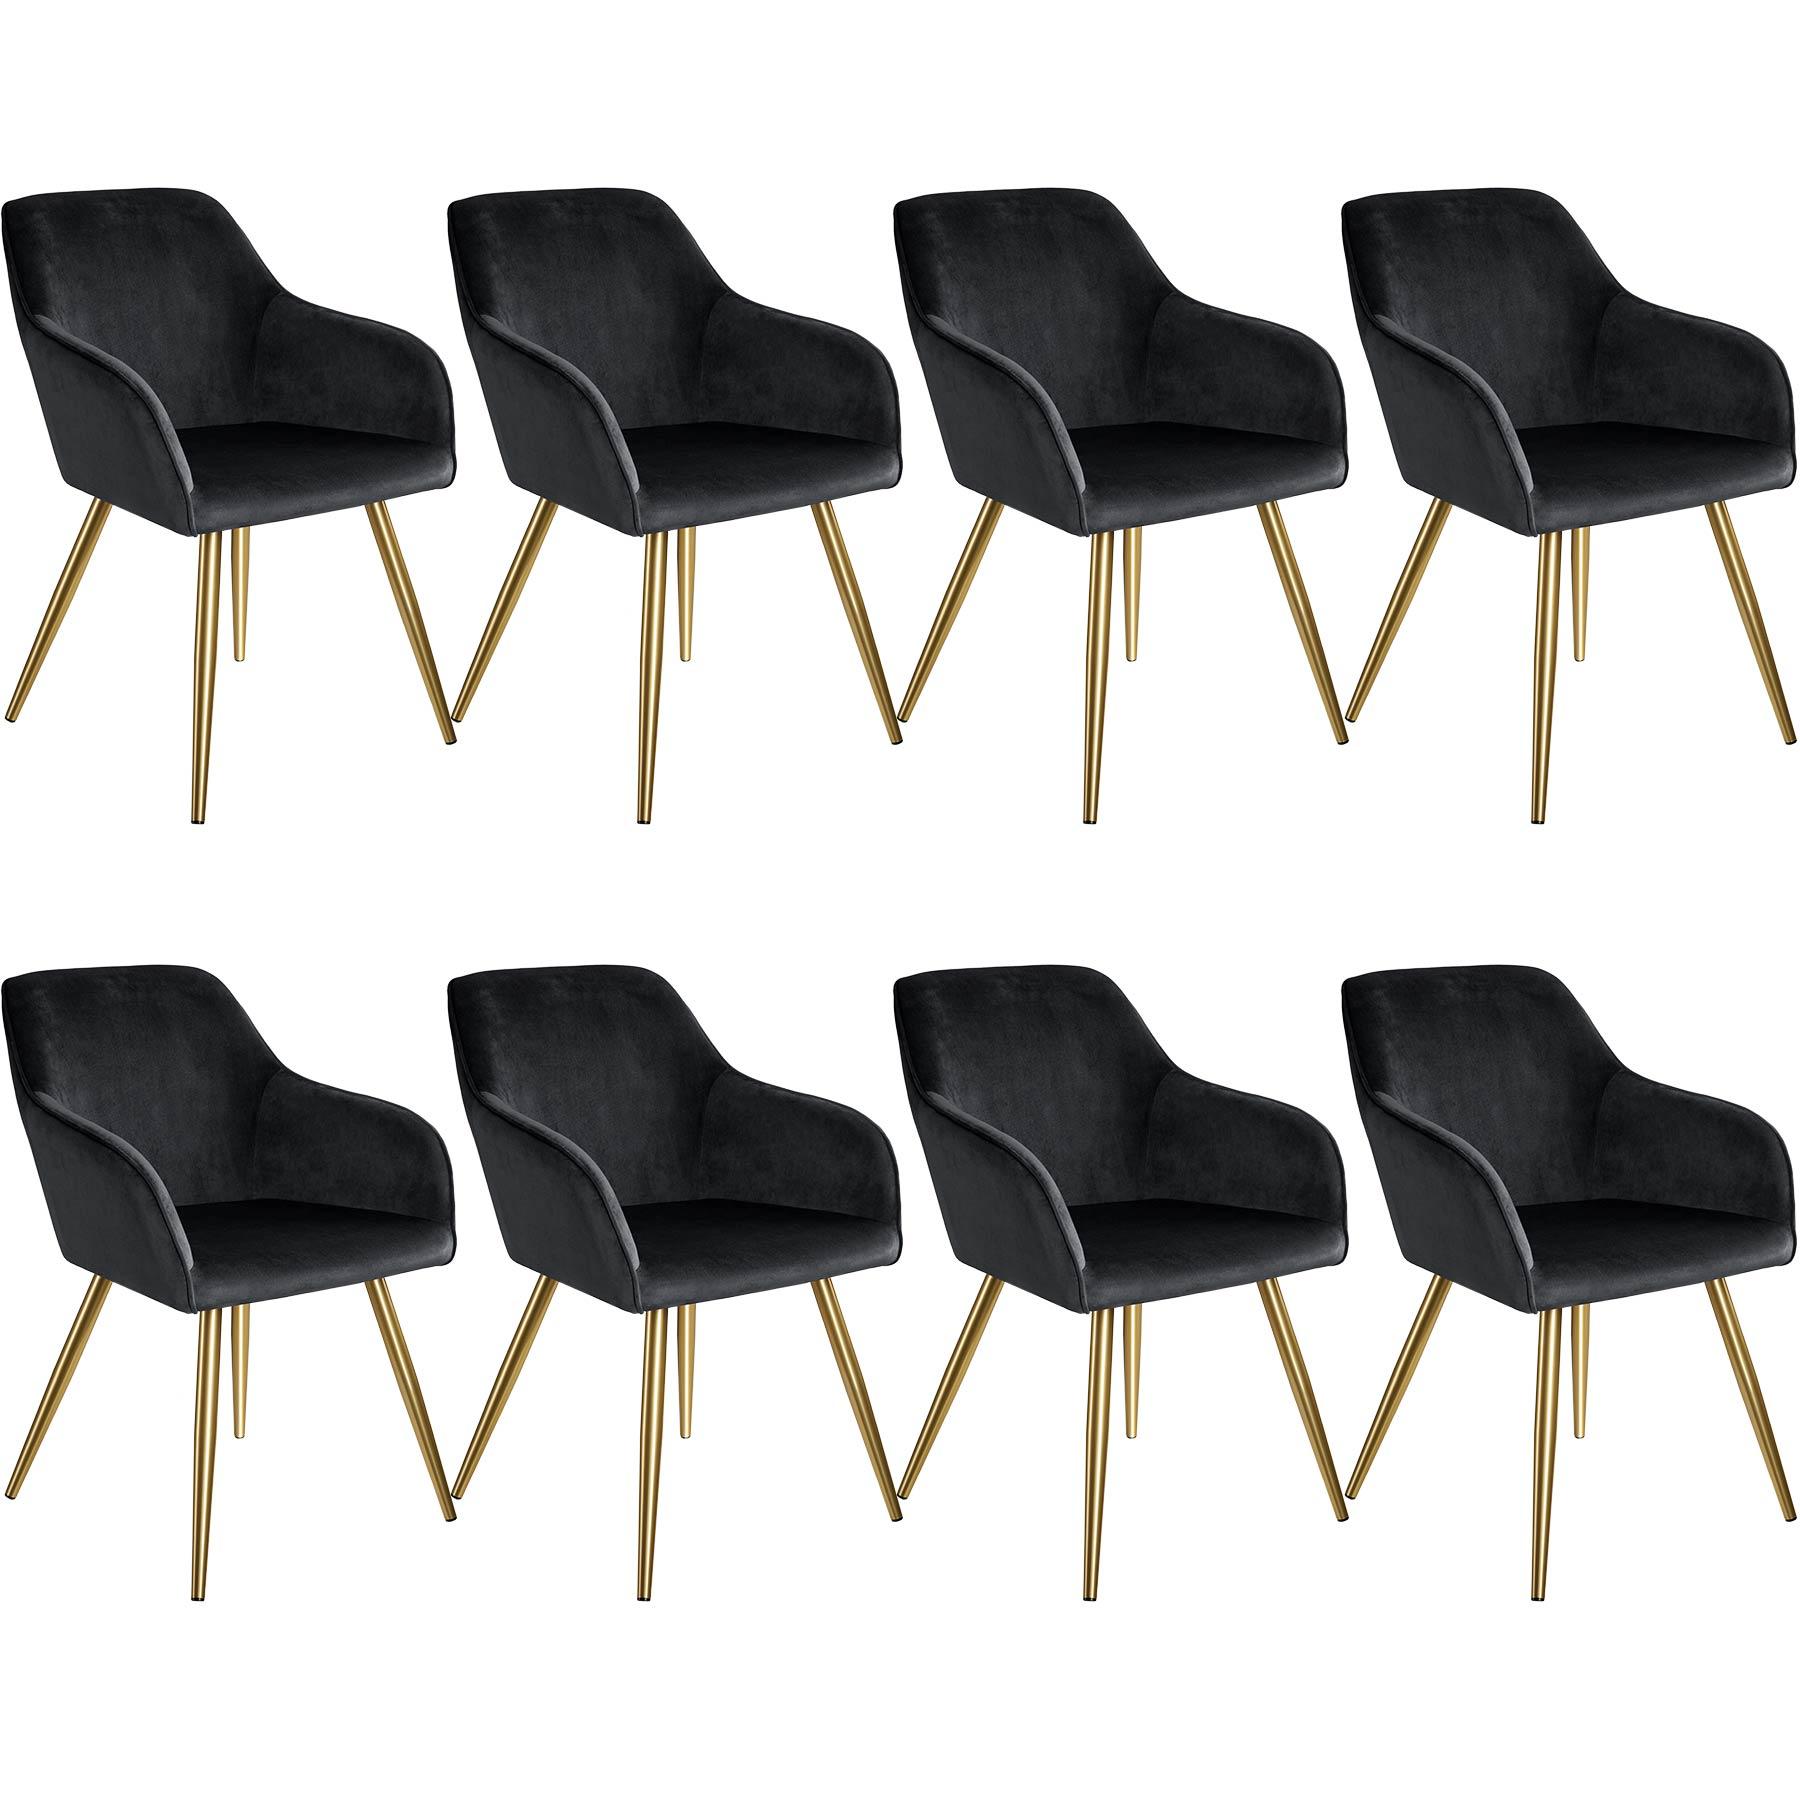 tectake 8 Marilyn Velvet-Look Chairs gold - black/gold